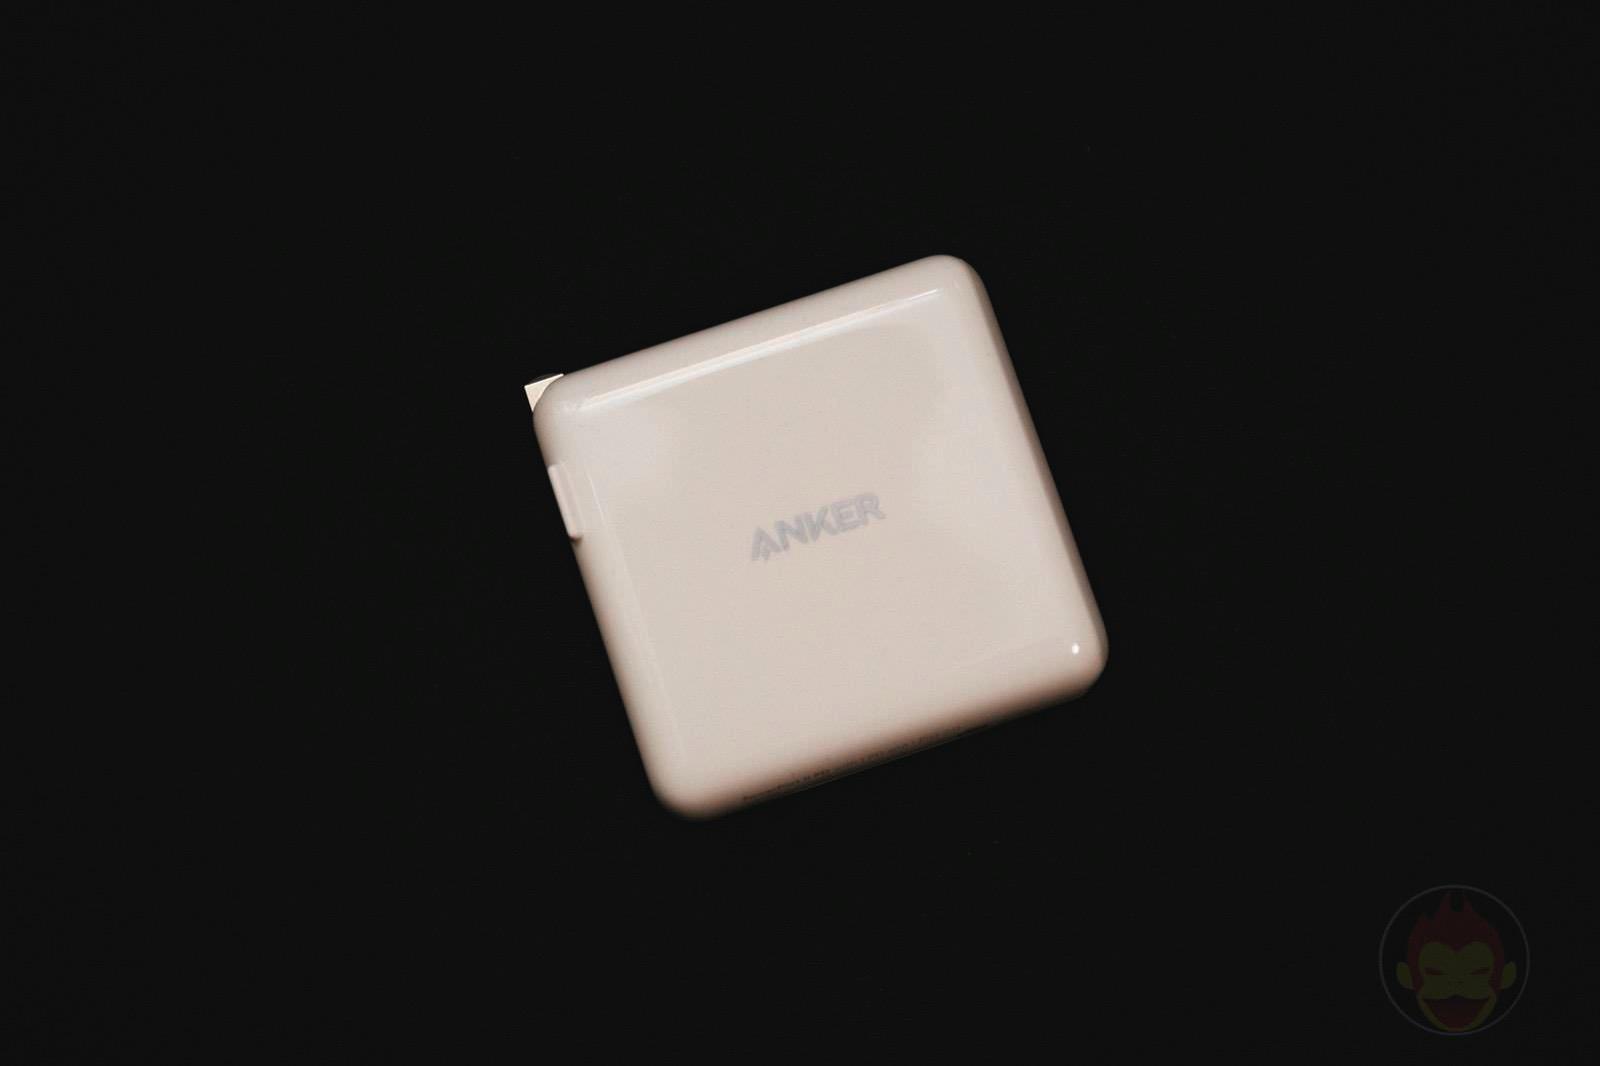 Anker-PowerPortt2-PD-1PD-and-1PowerIQ2-01.jpg